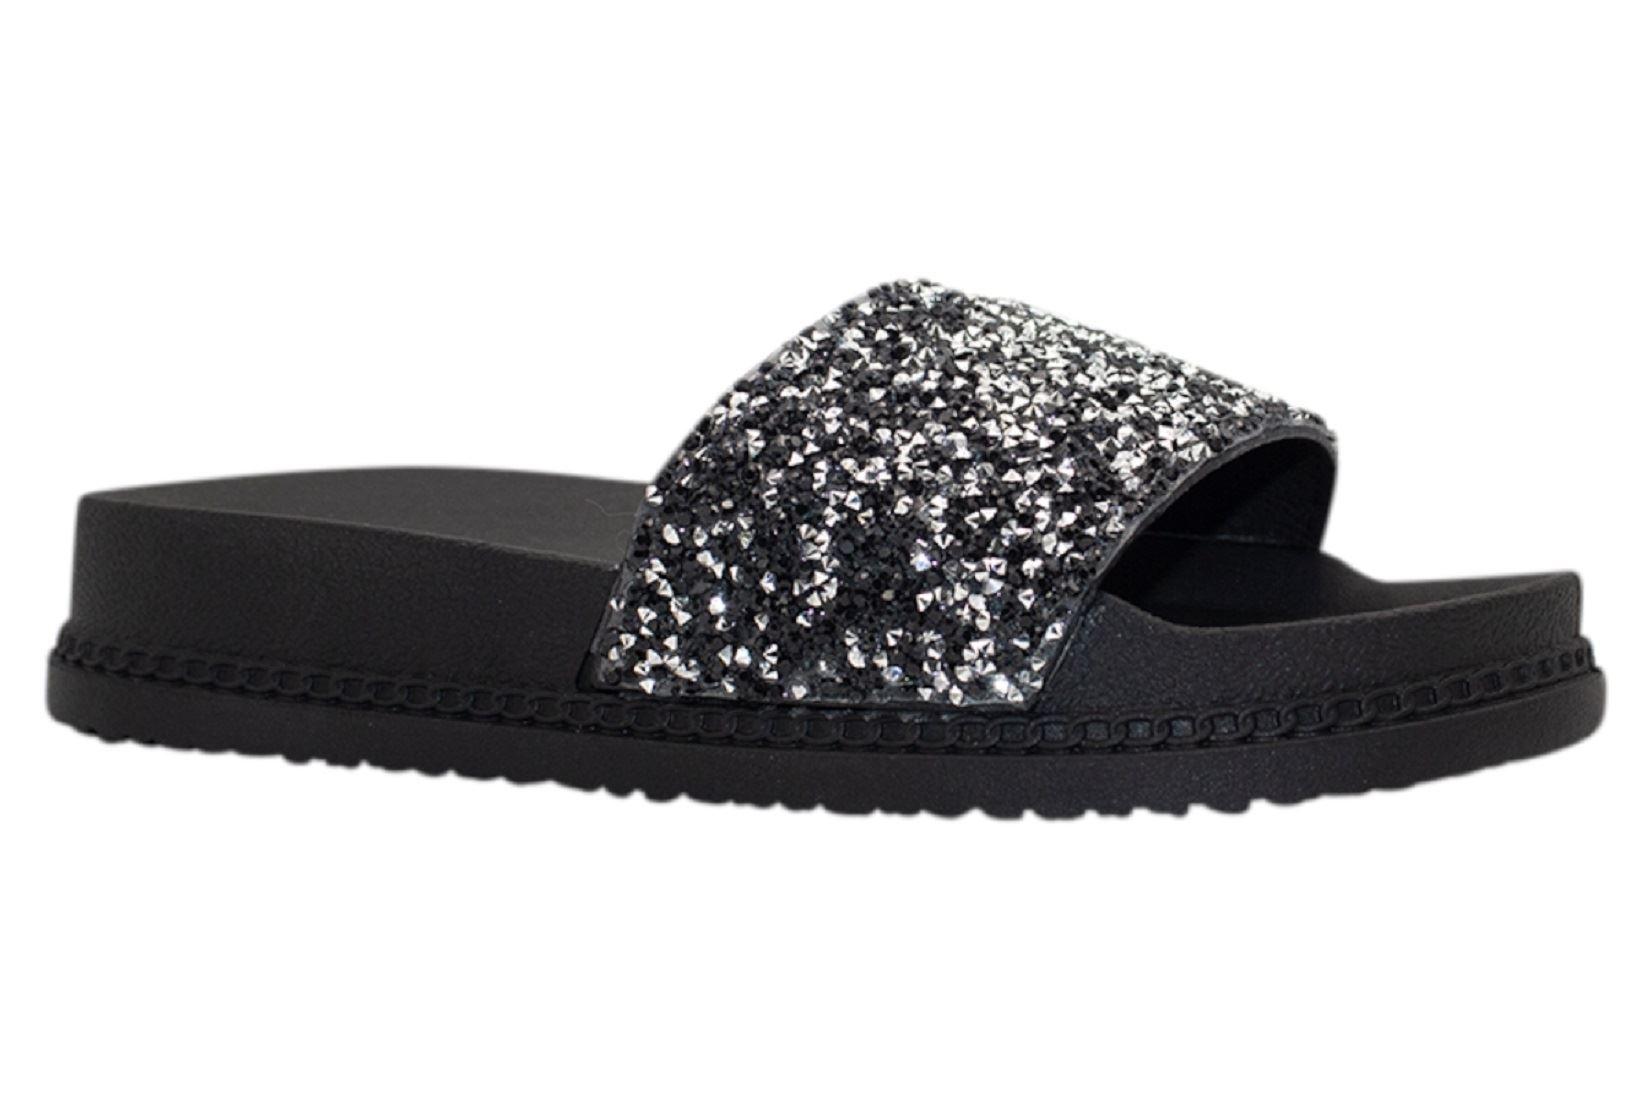 Womens-Sliders-Casual-Slippers-Mules-Ladies-Diamante-Flip-Flop-Sandals-Shoes thumbnail 84